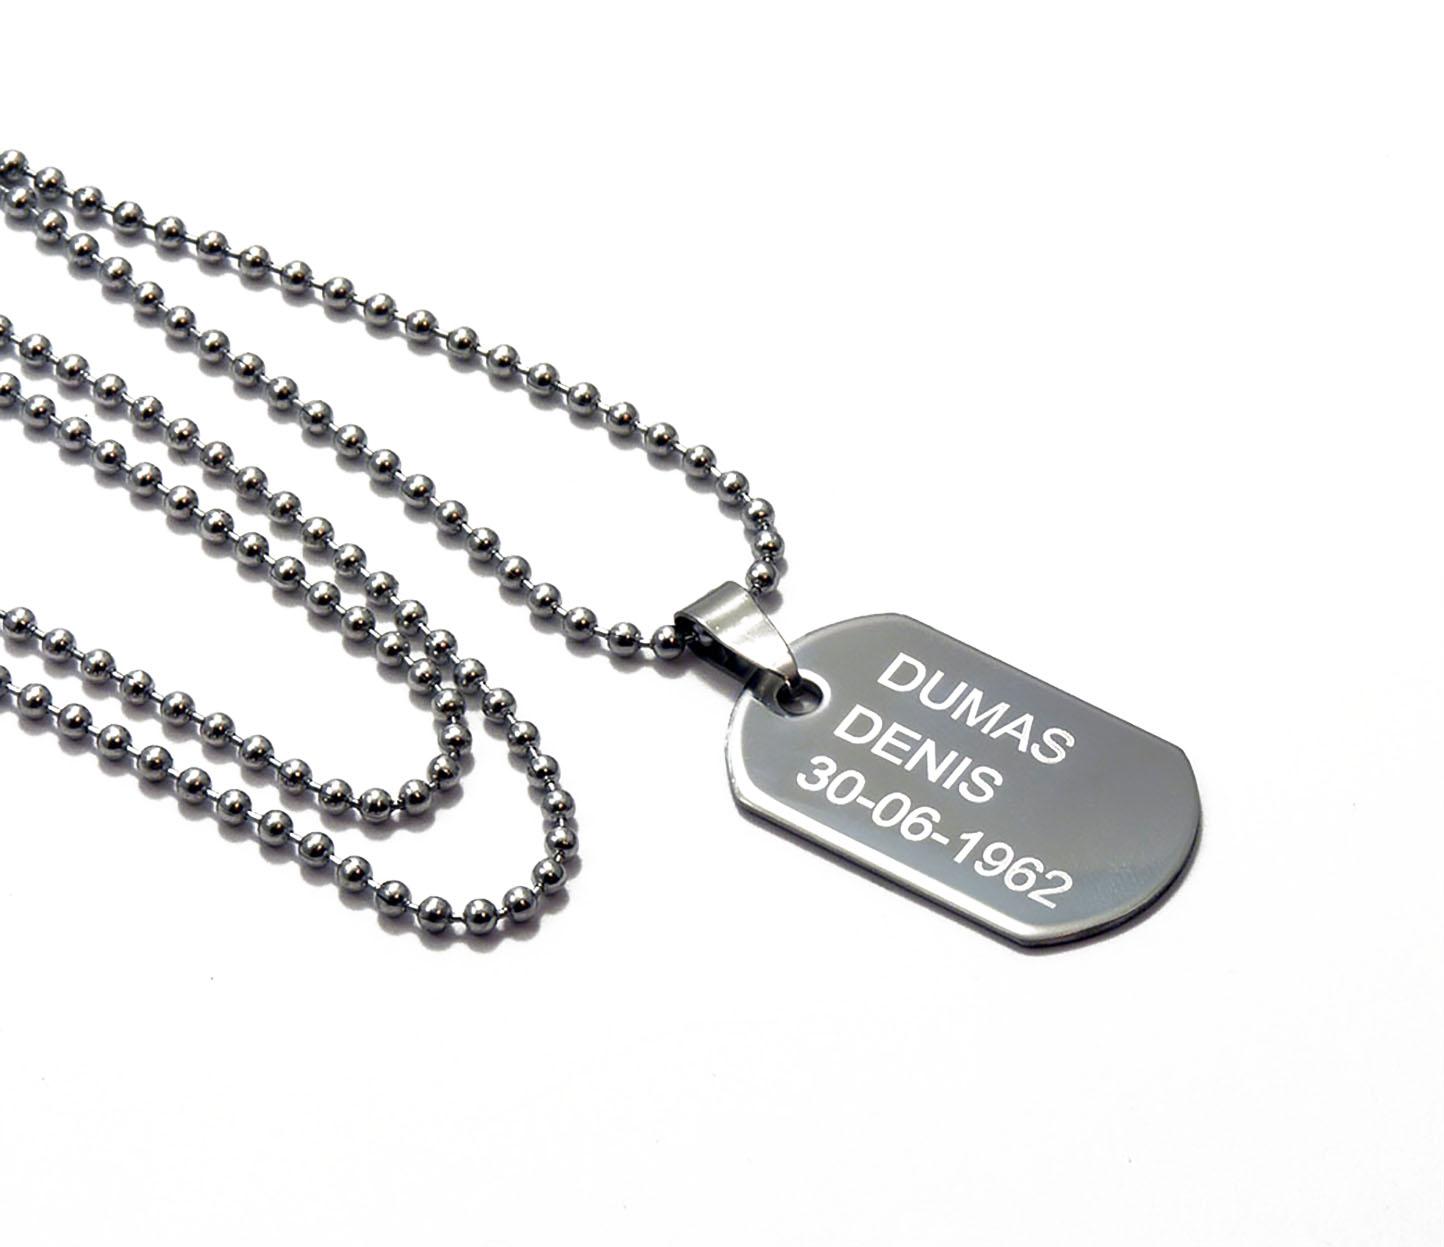 collier pendentif personnalis type militaire marquage. Black Bedroom Furniture Sets. Home Design Ideas